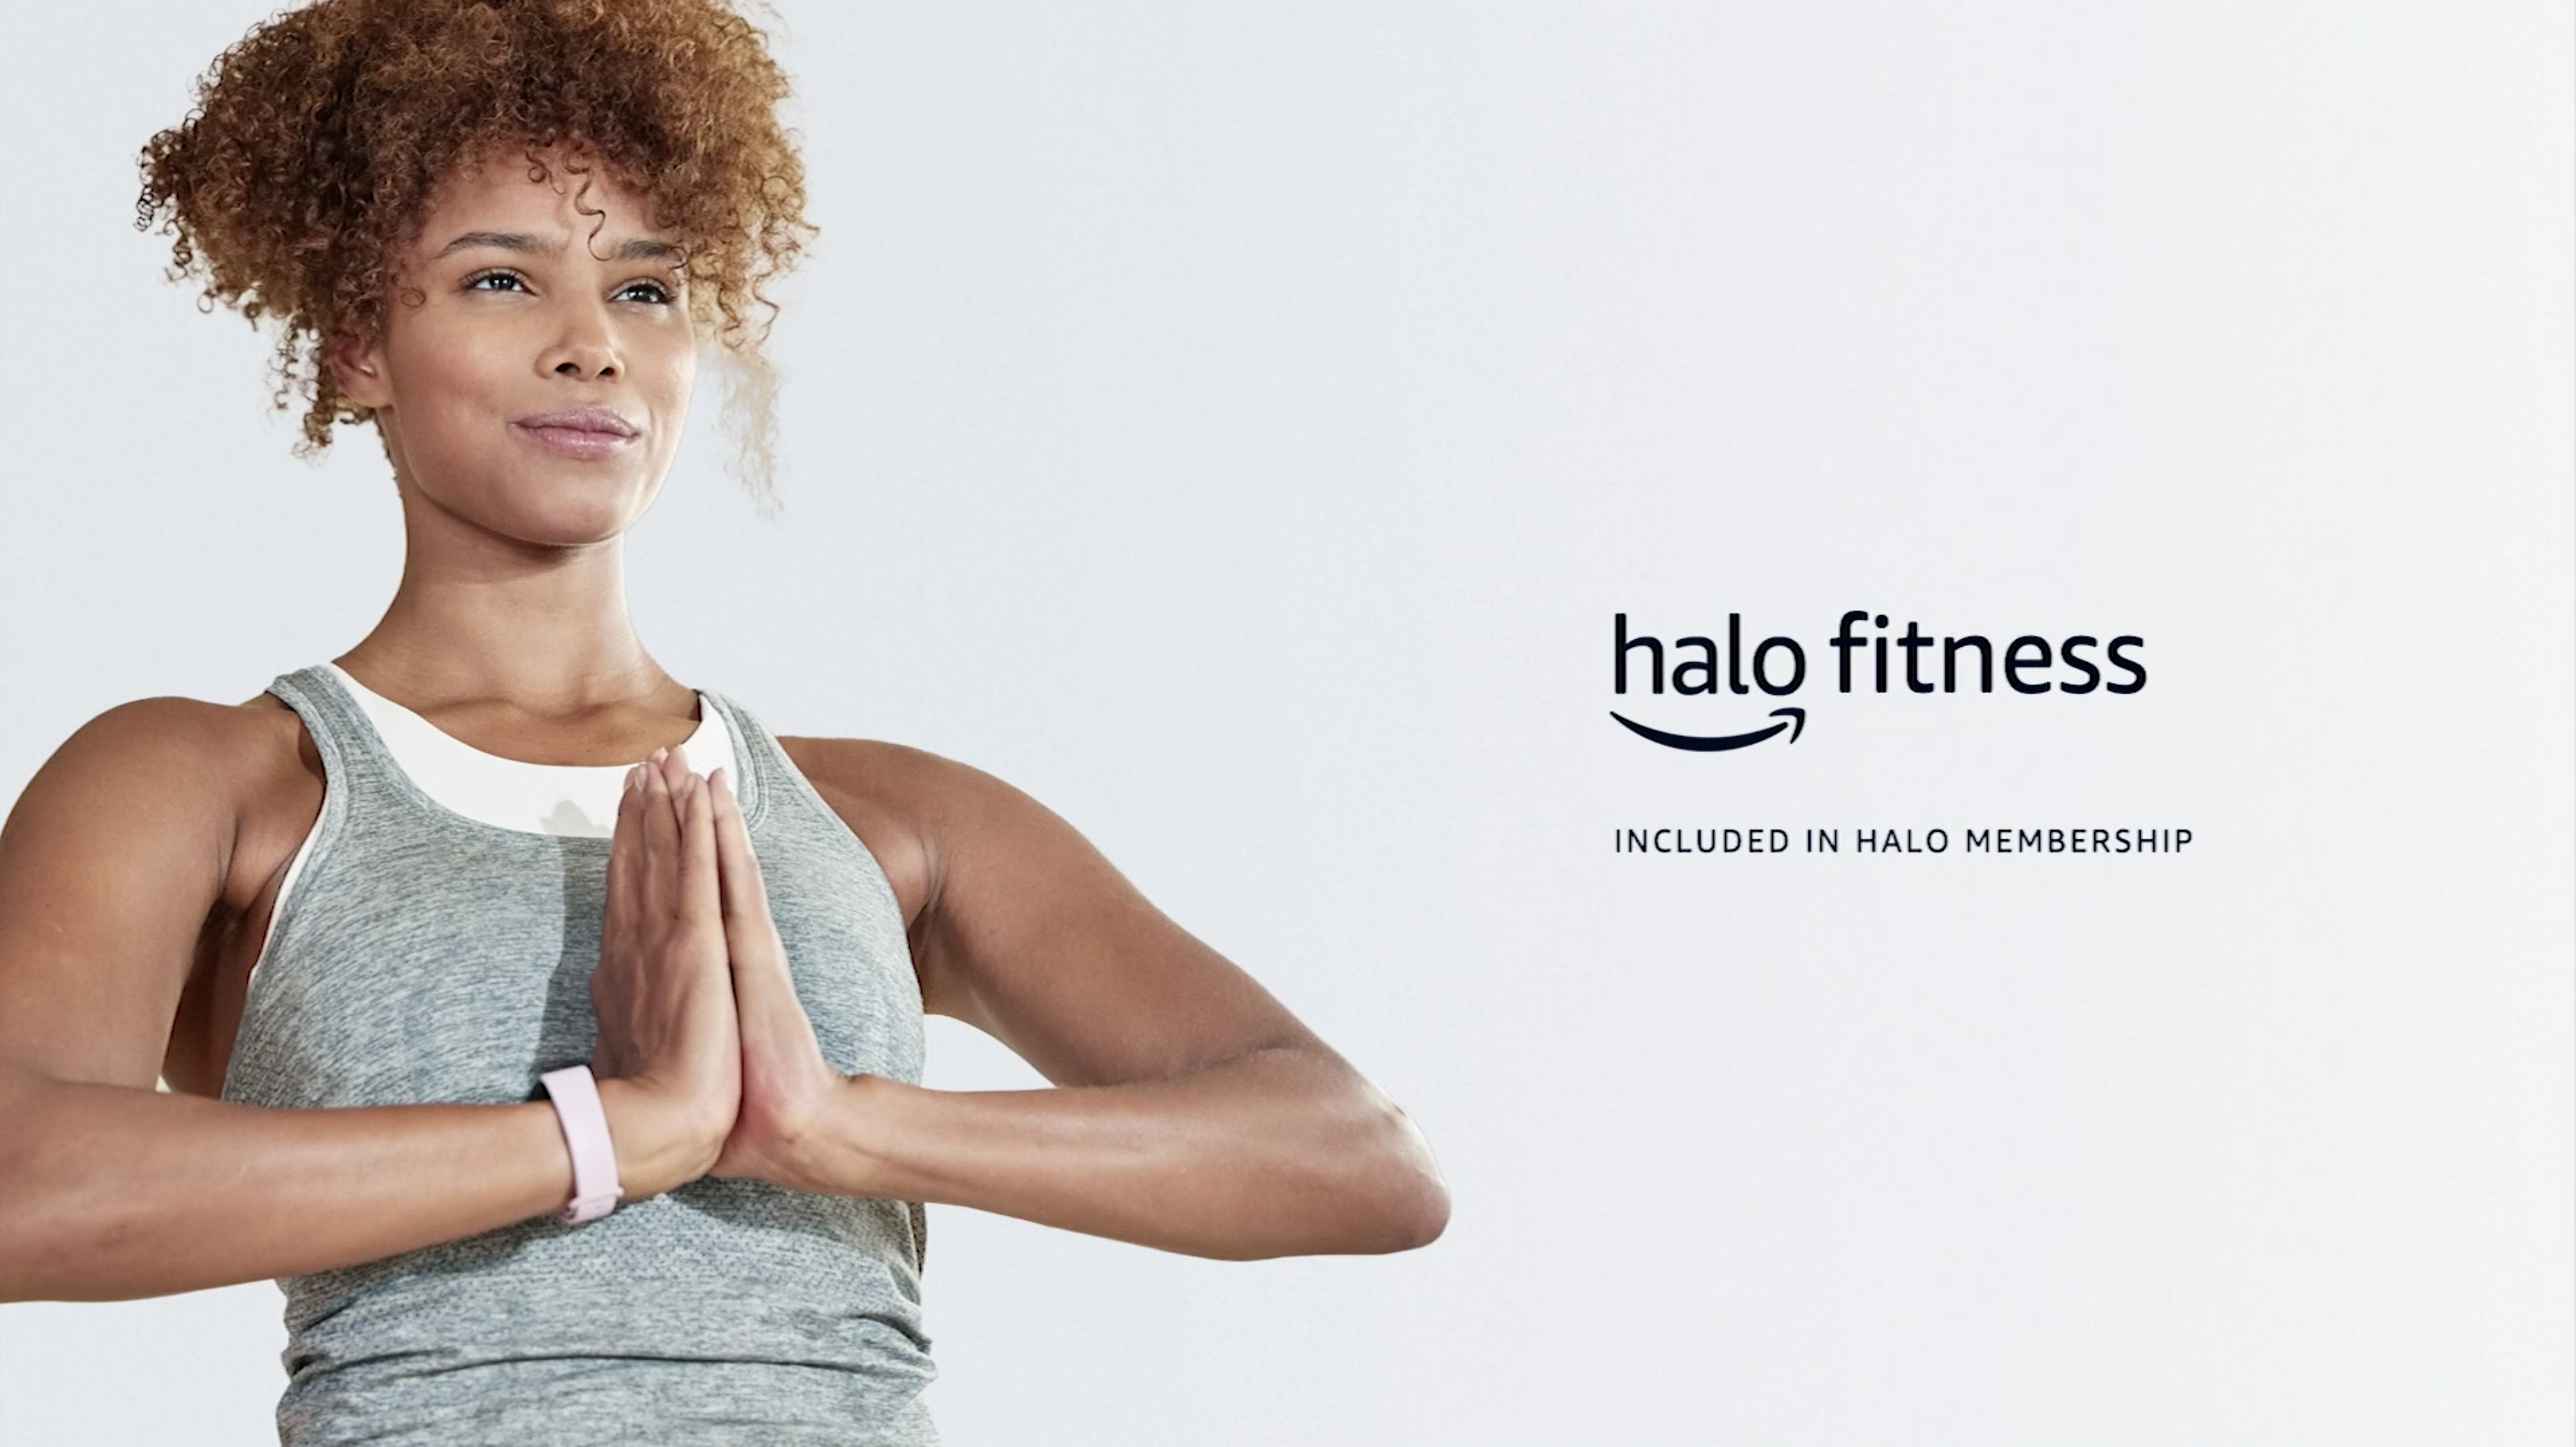 Amazon Halo Fitness at the Amazon event